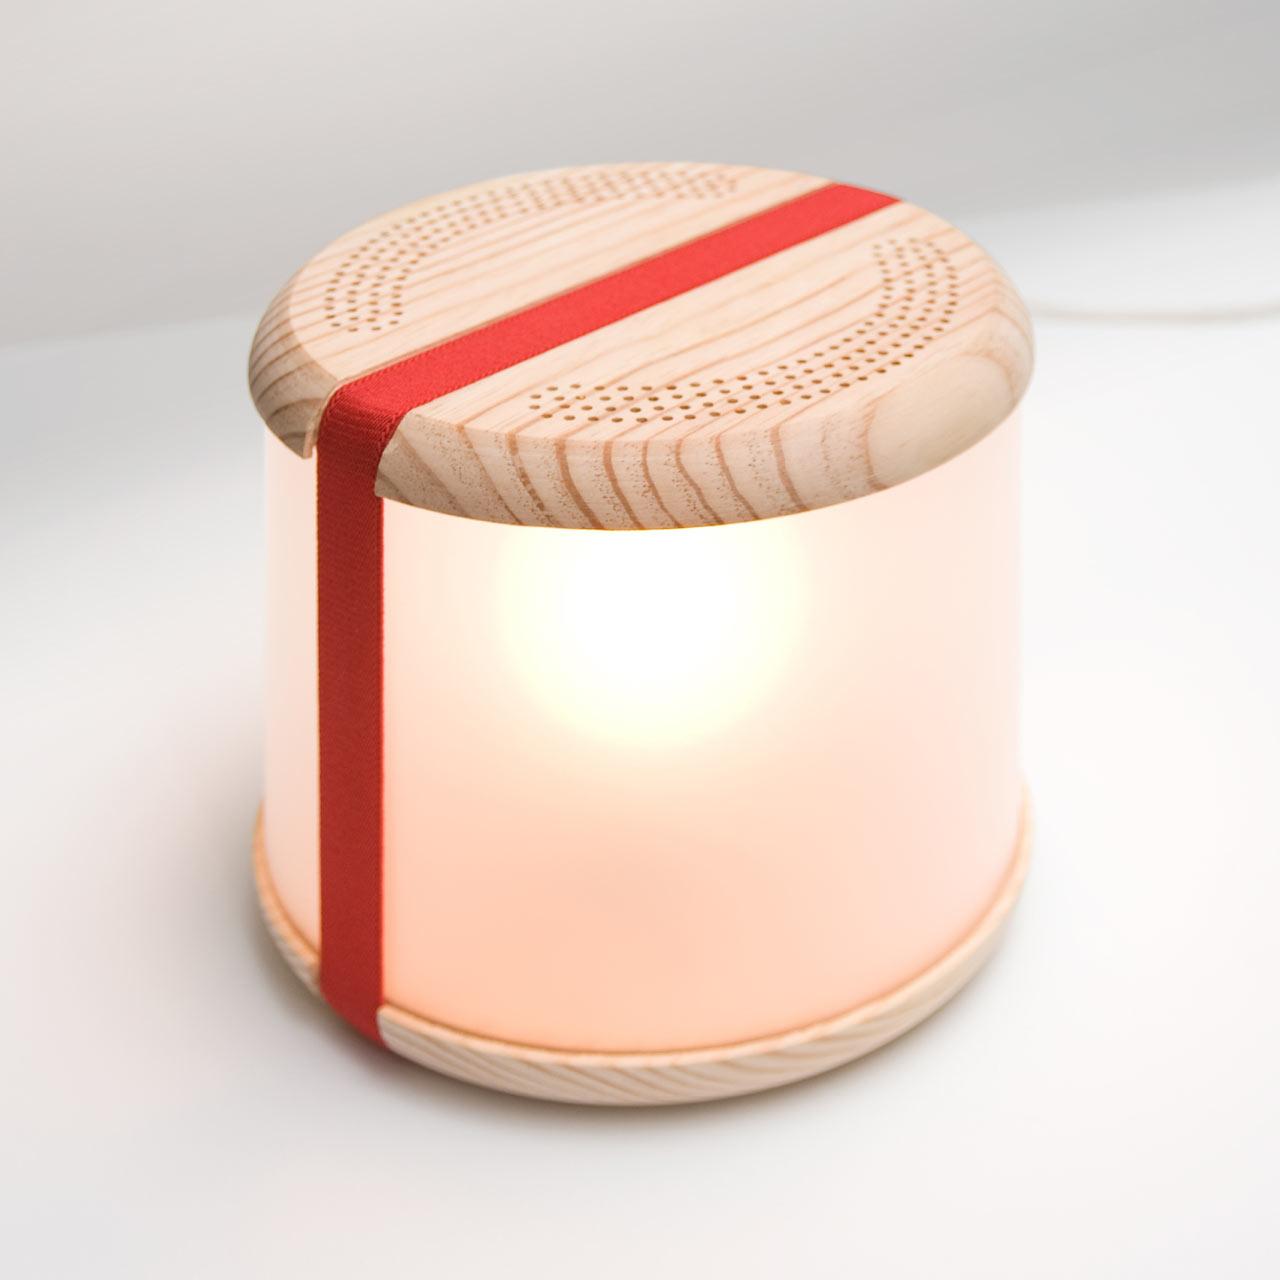 bento-box-lamp